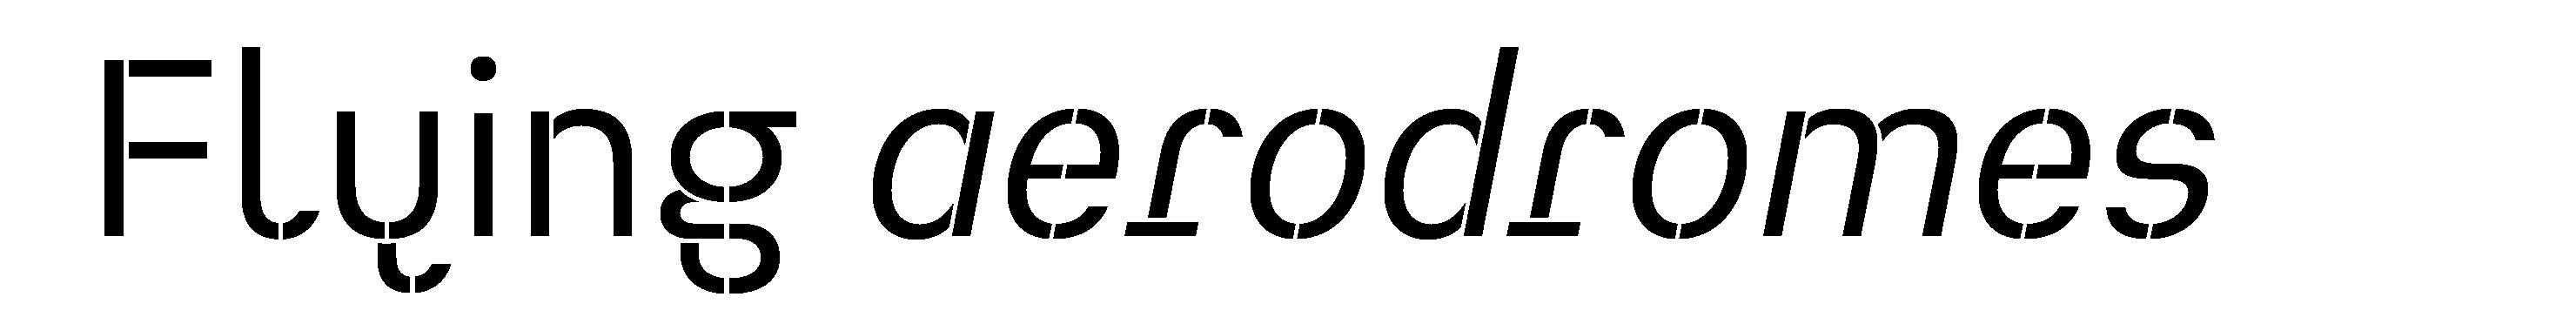 Typeface Heimat Stencil D03 Atlas Font Foundry